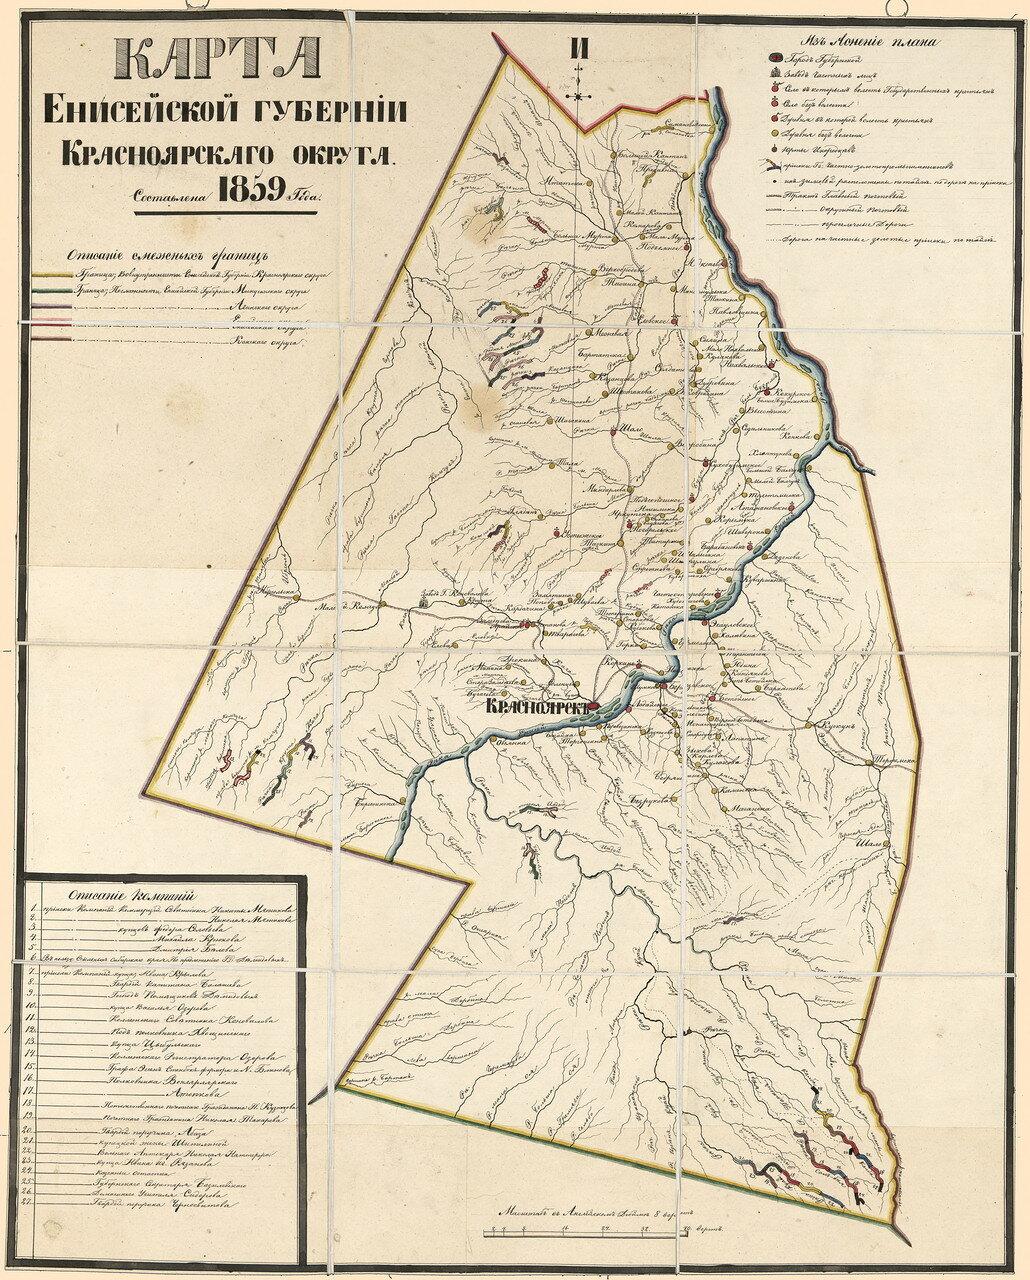 Красноярский округ. 1859